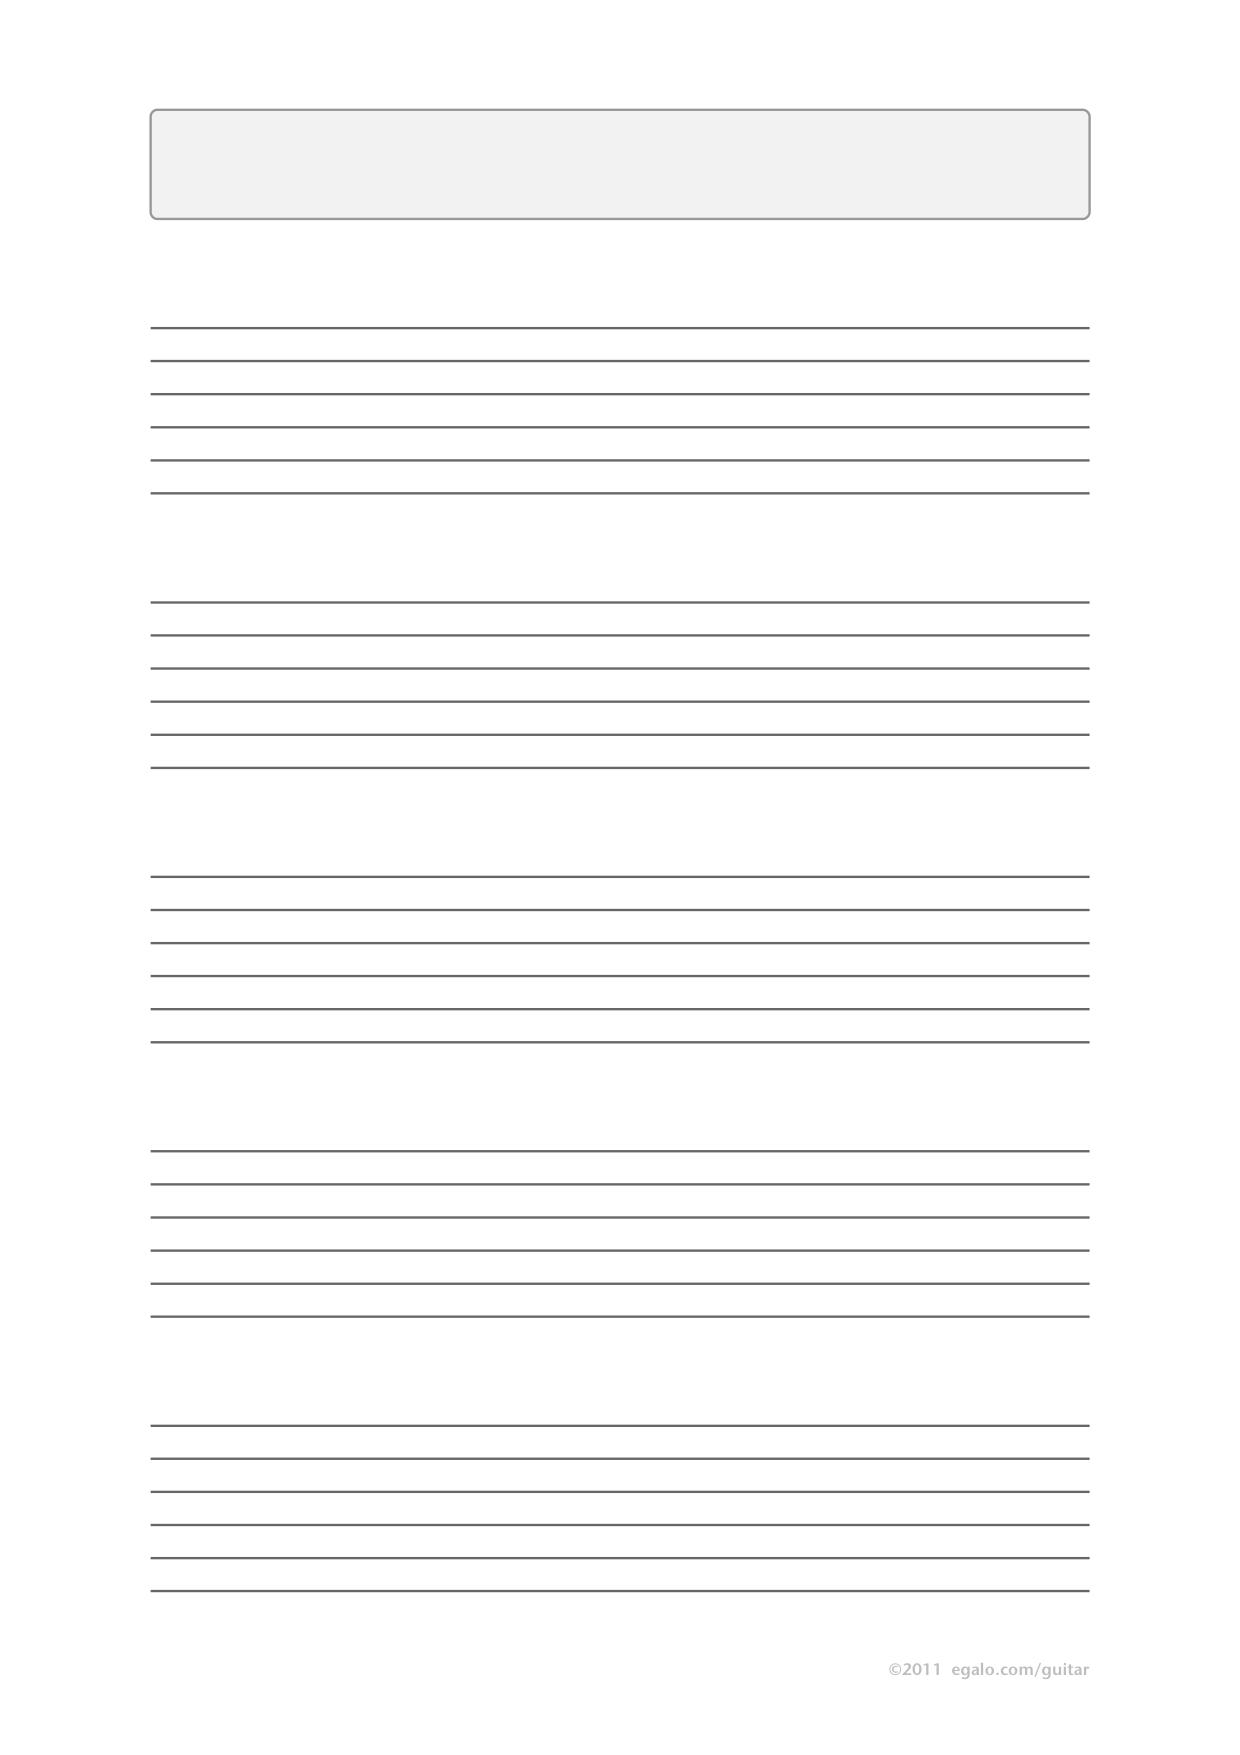 Pdf Blank Guitar Tab Template